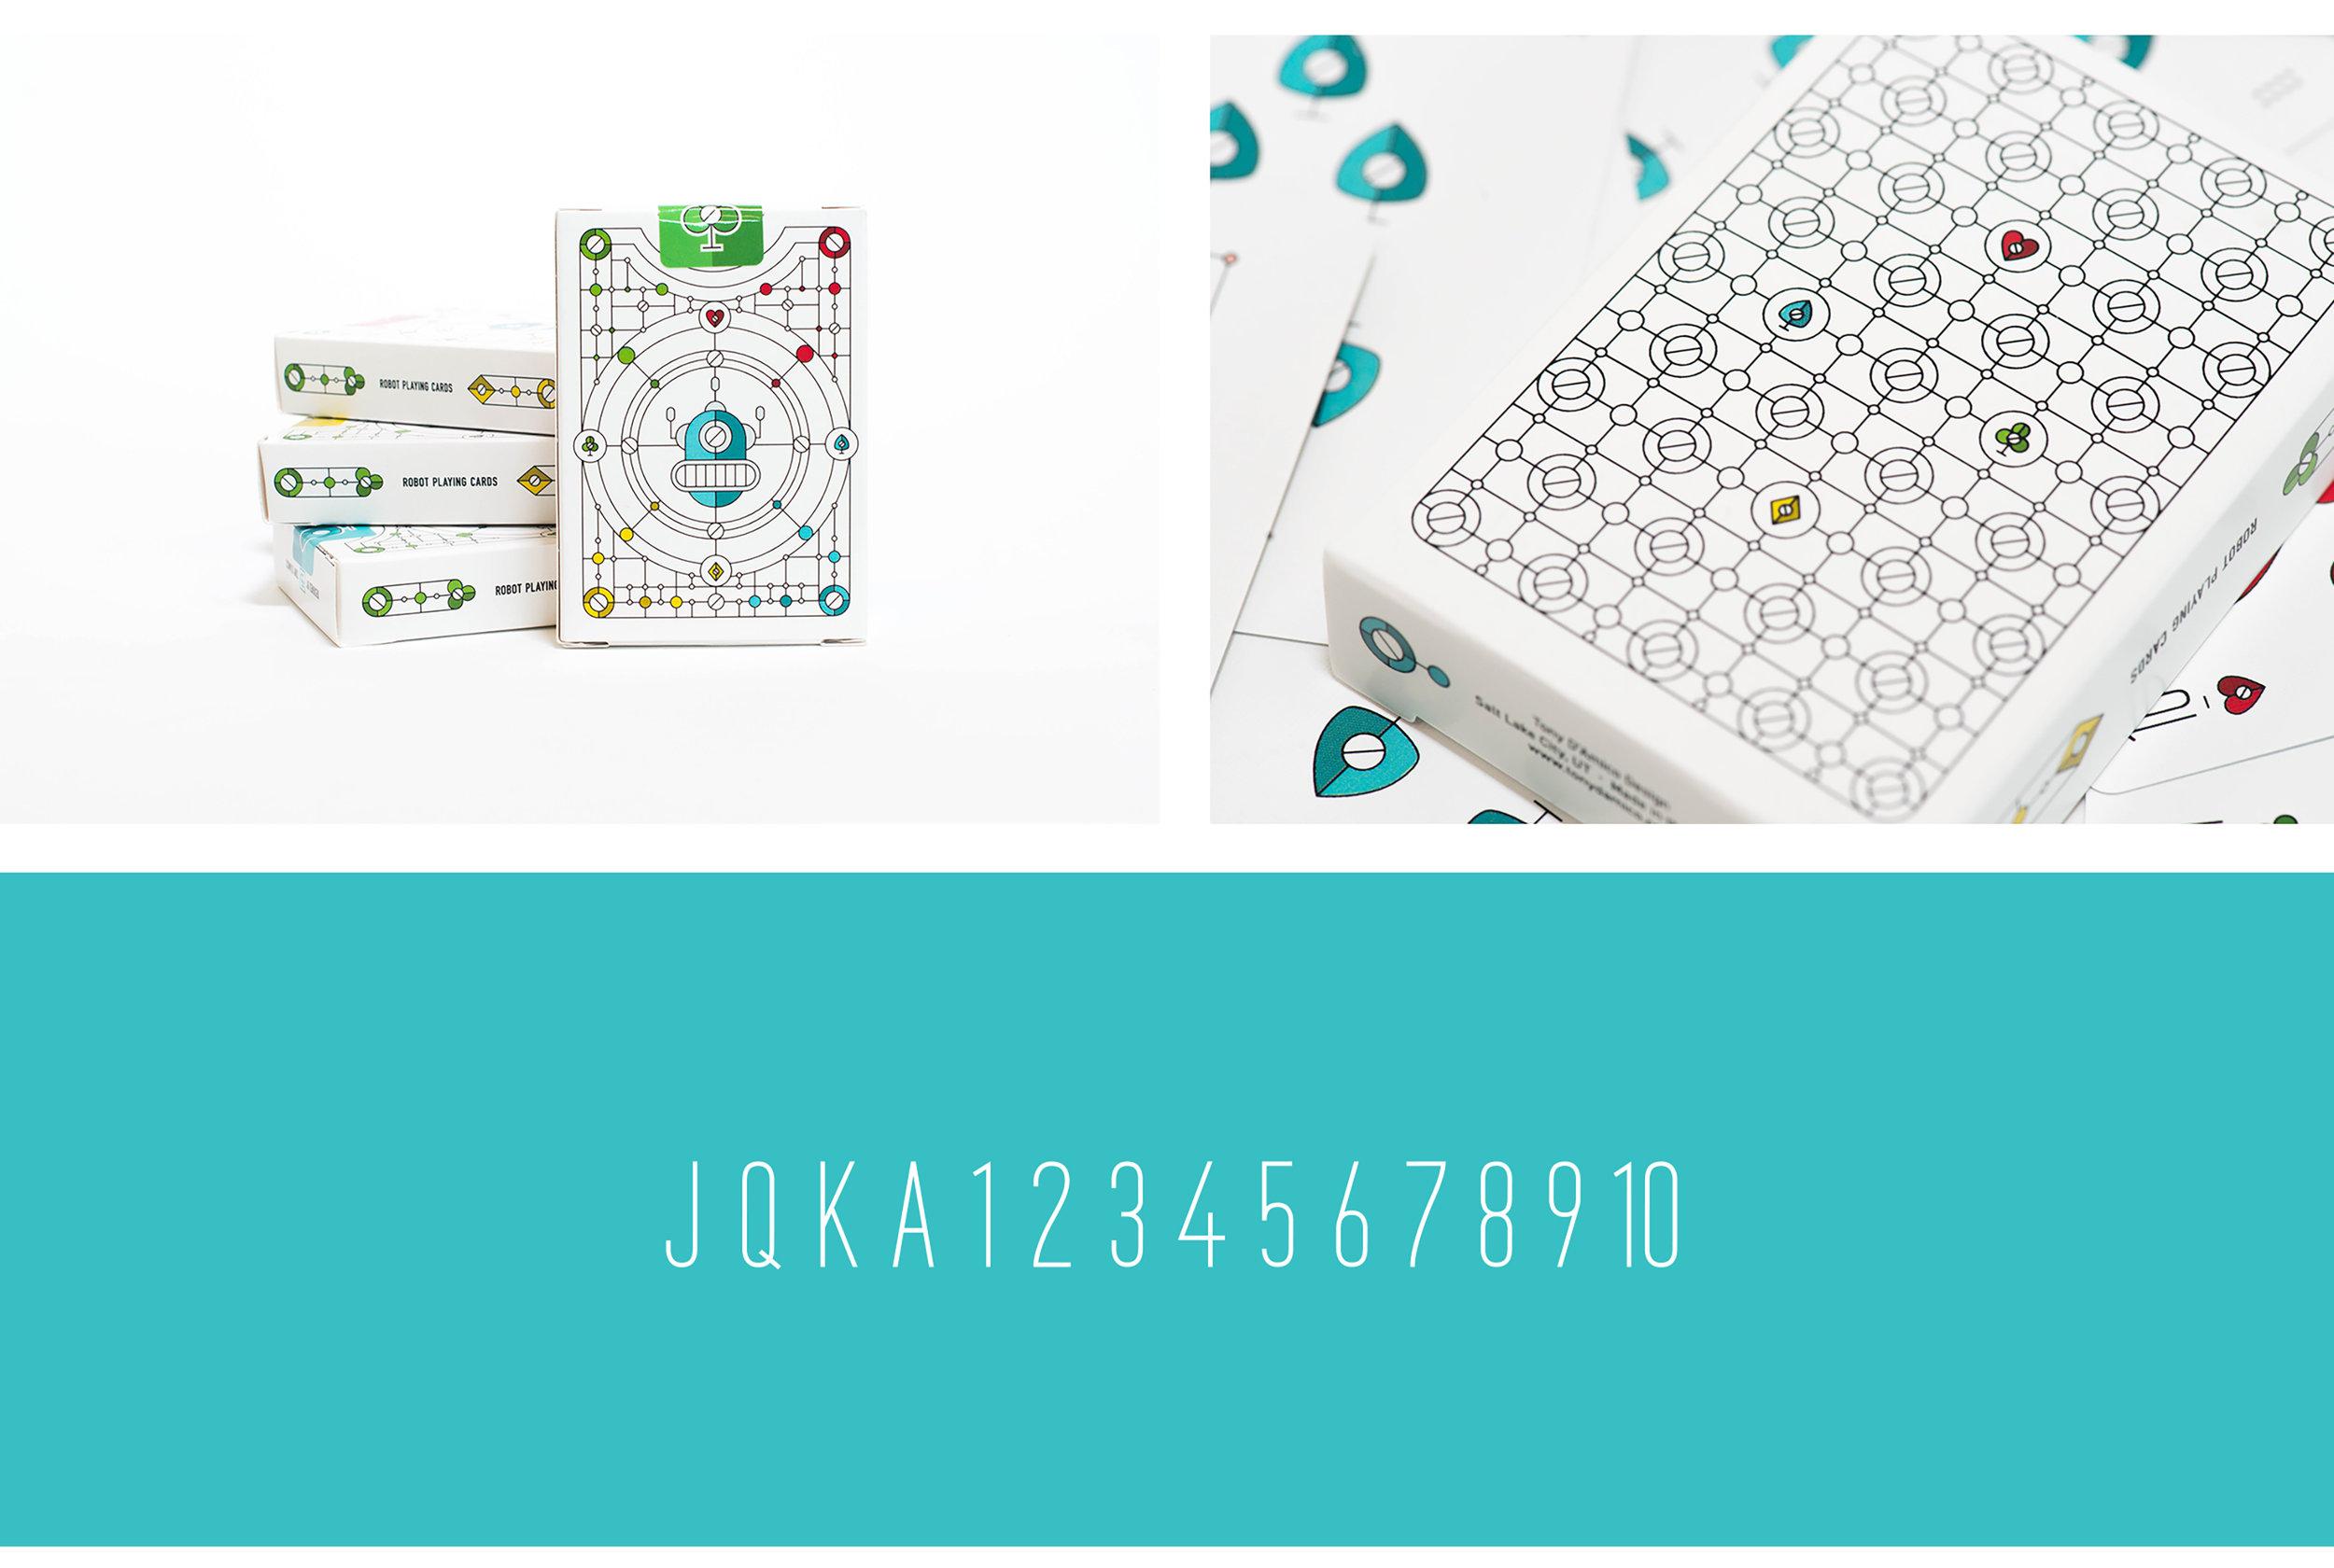 Robot-Playing-Cards_02.jpg